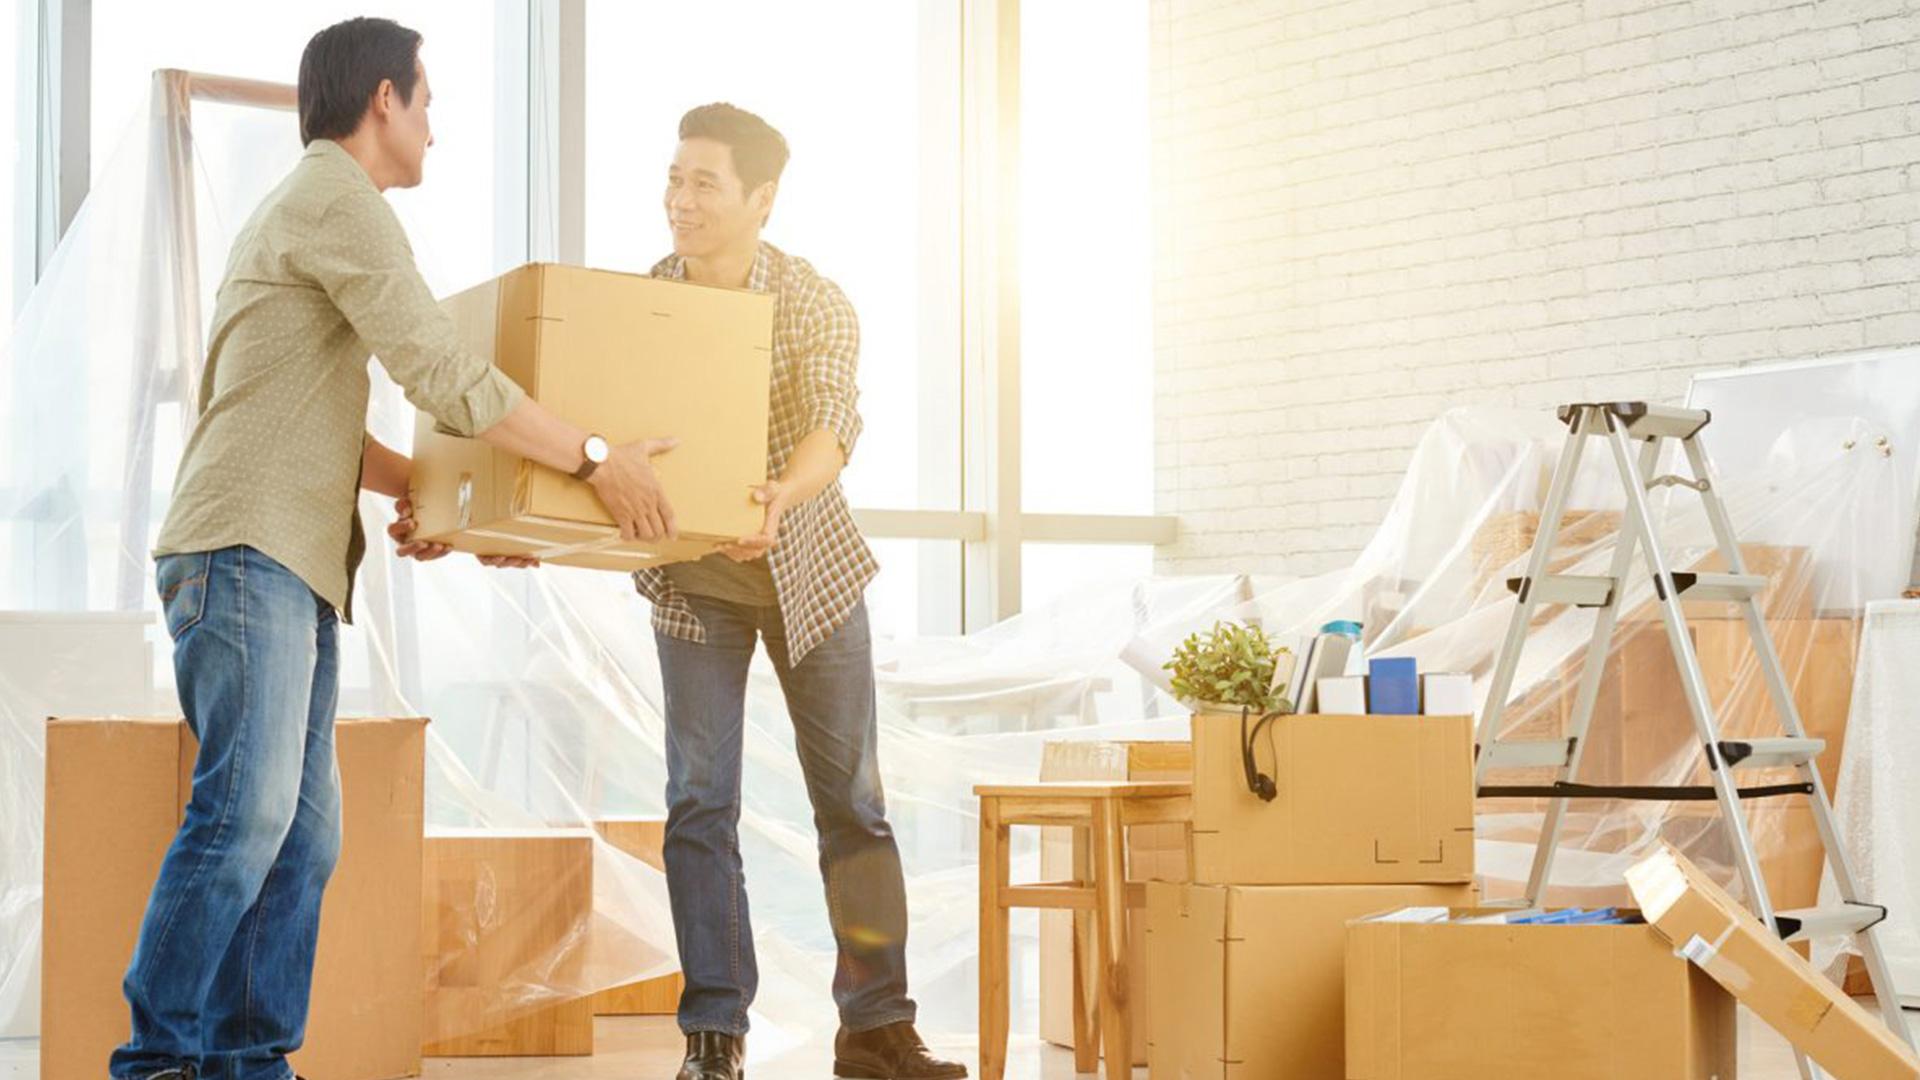 Residential movers Atlanta GA